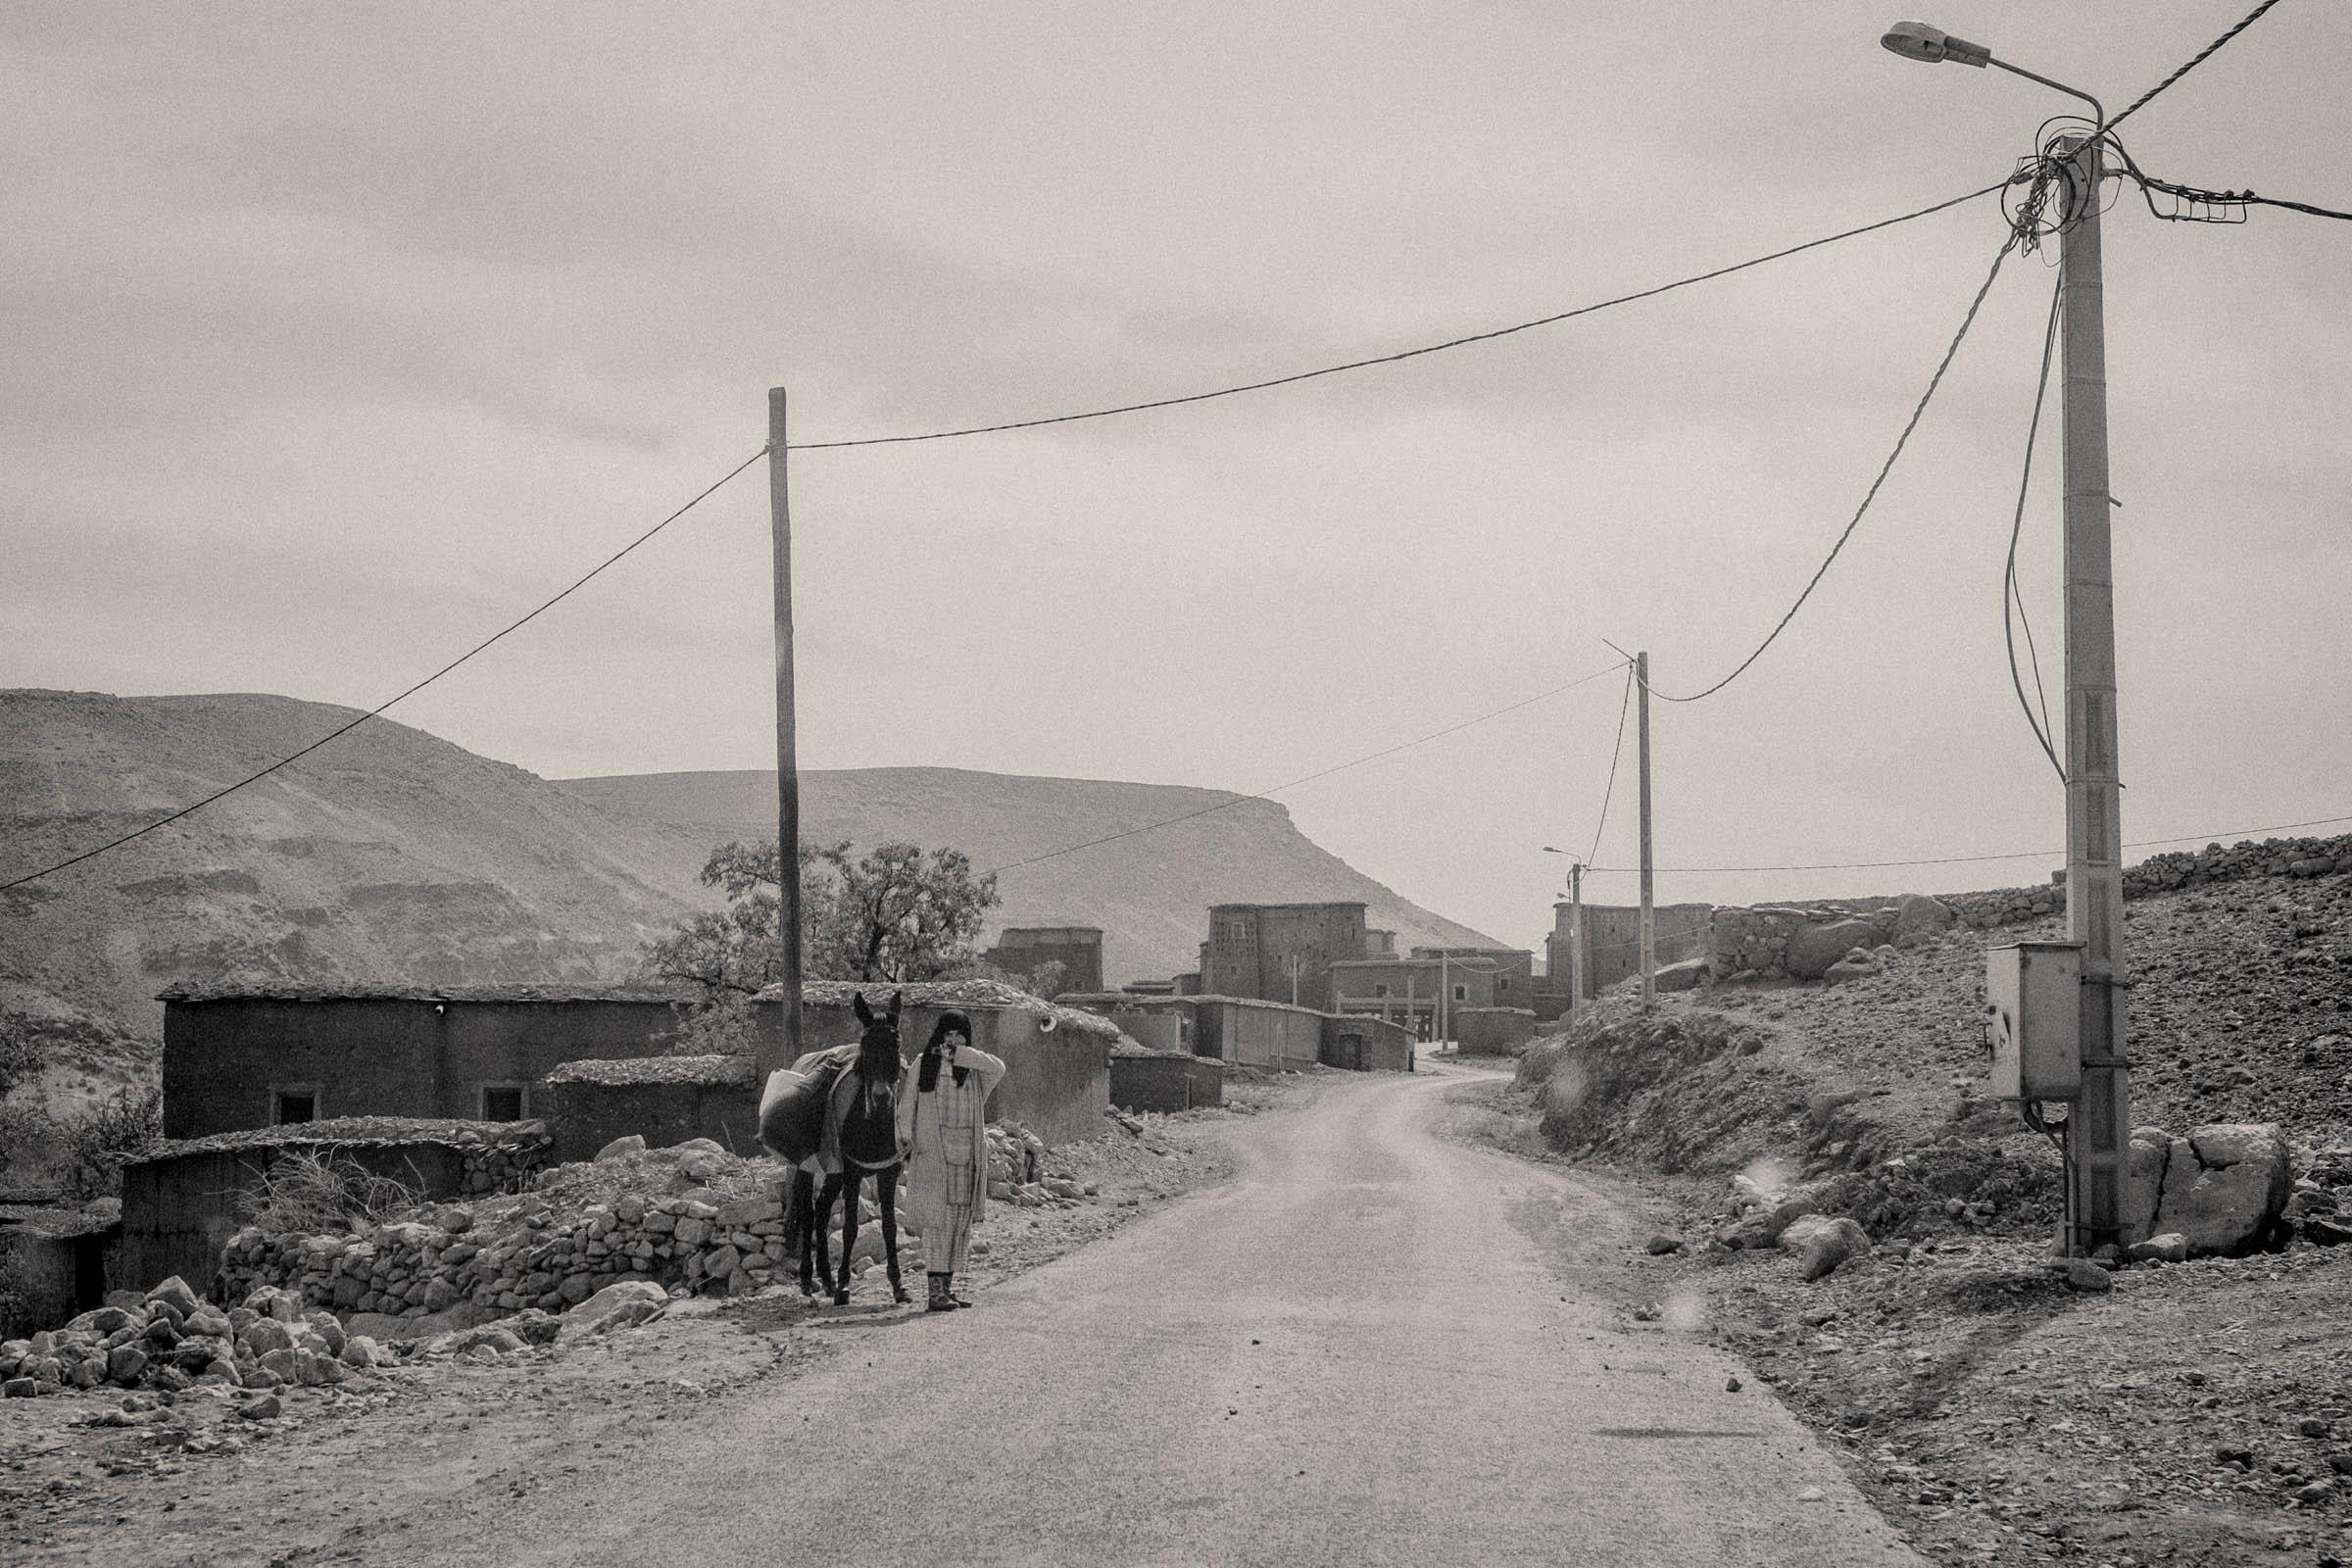 Maroccan streetside (2014)